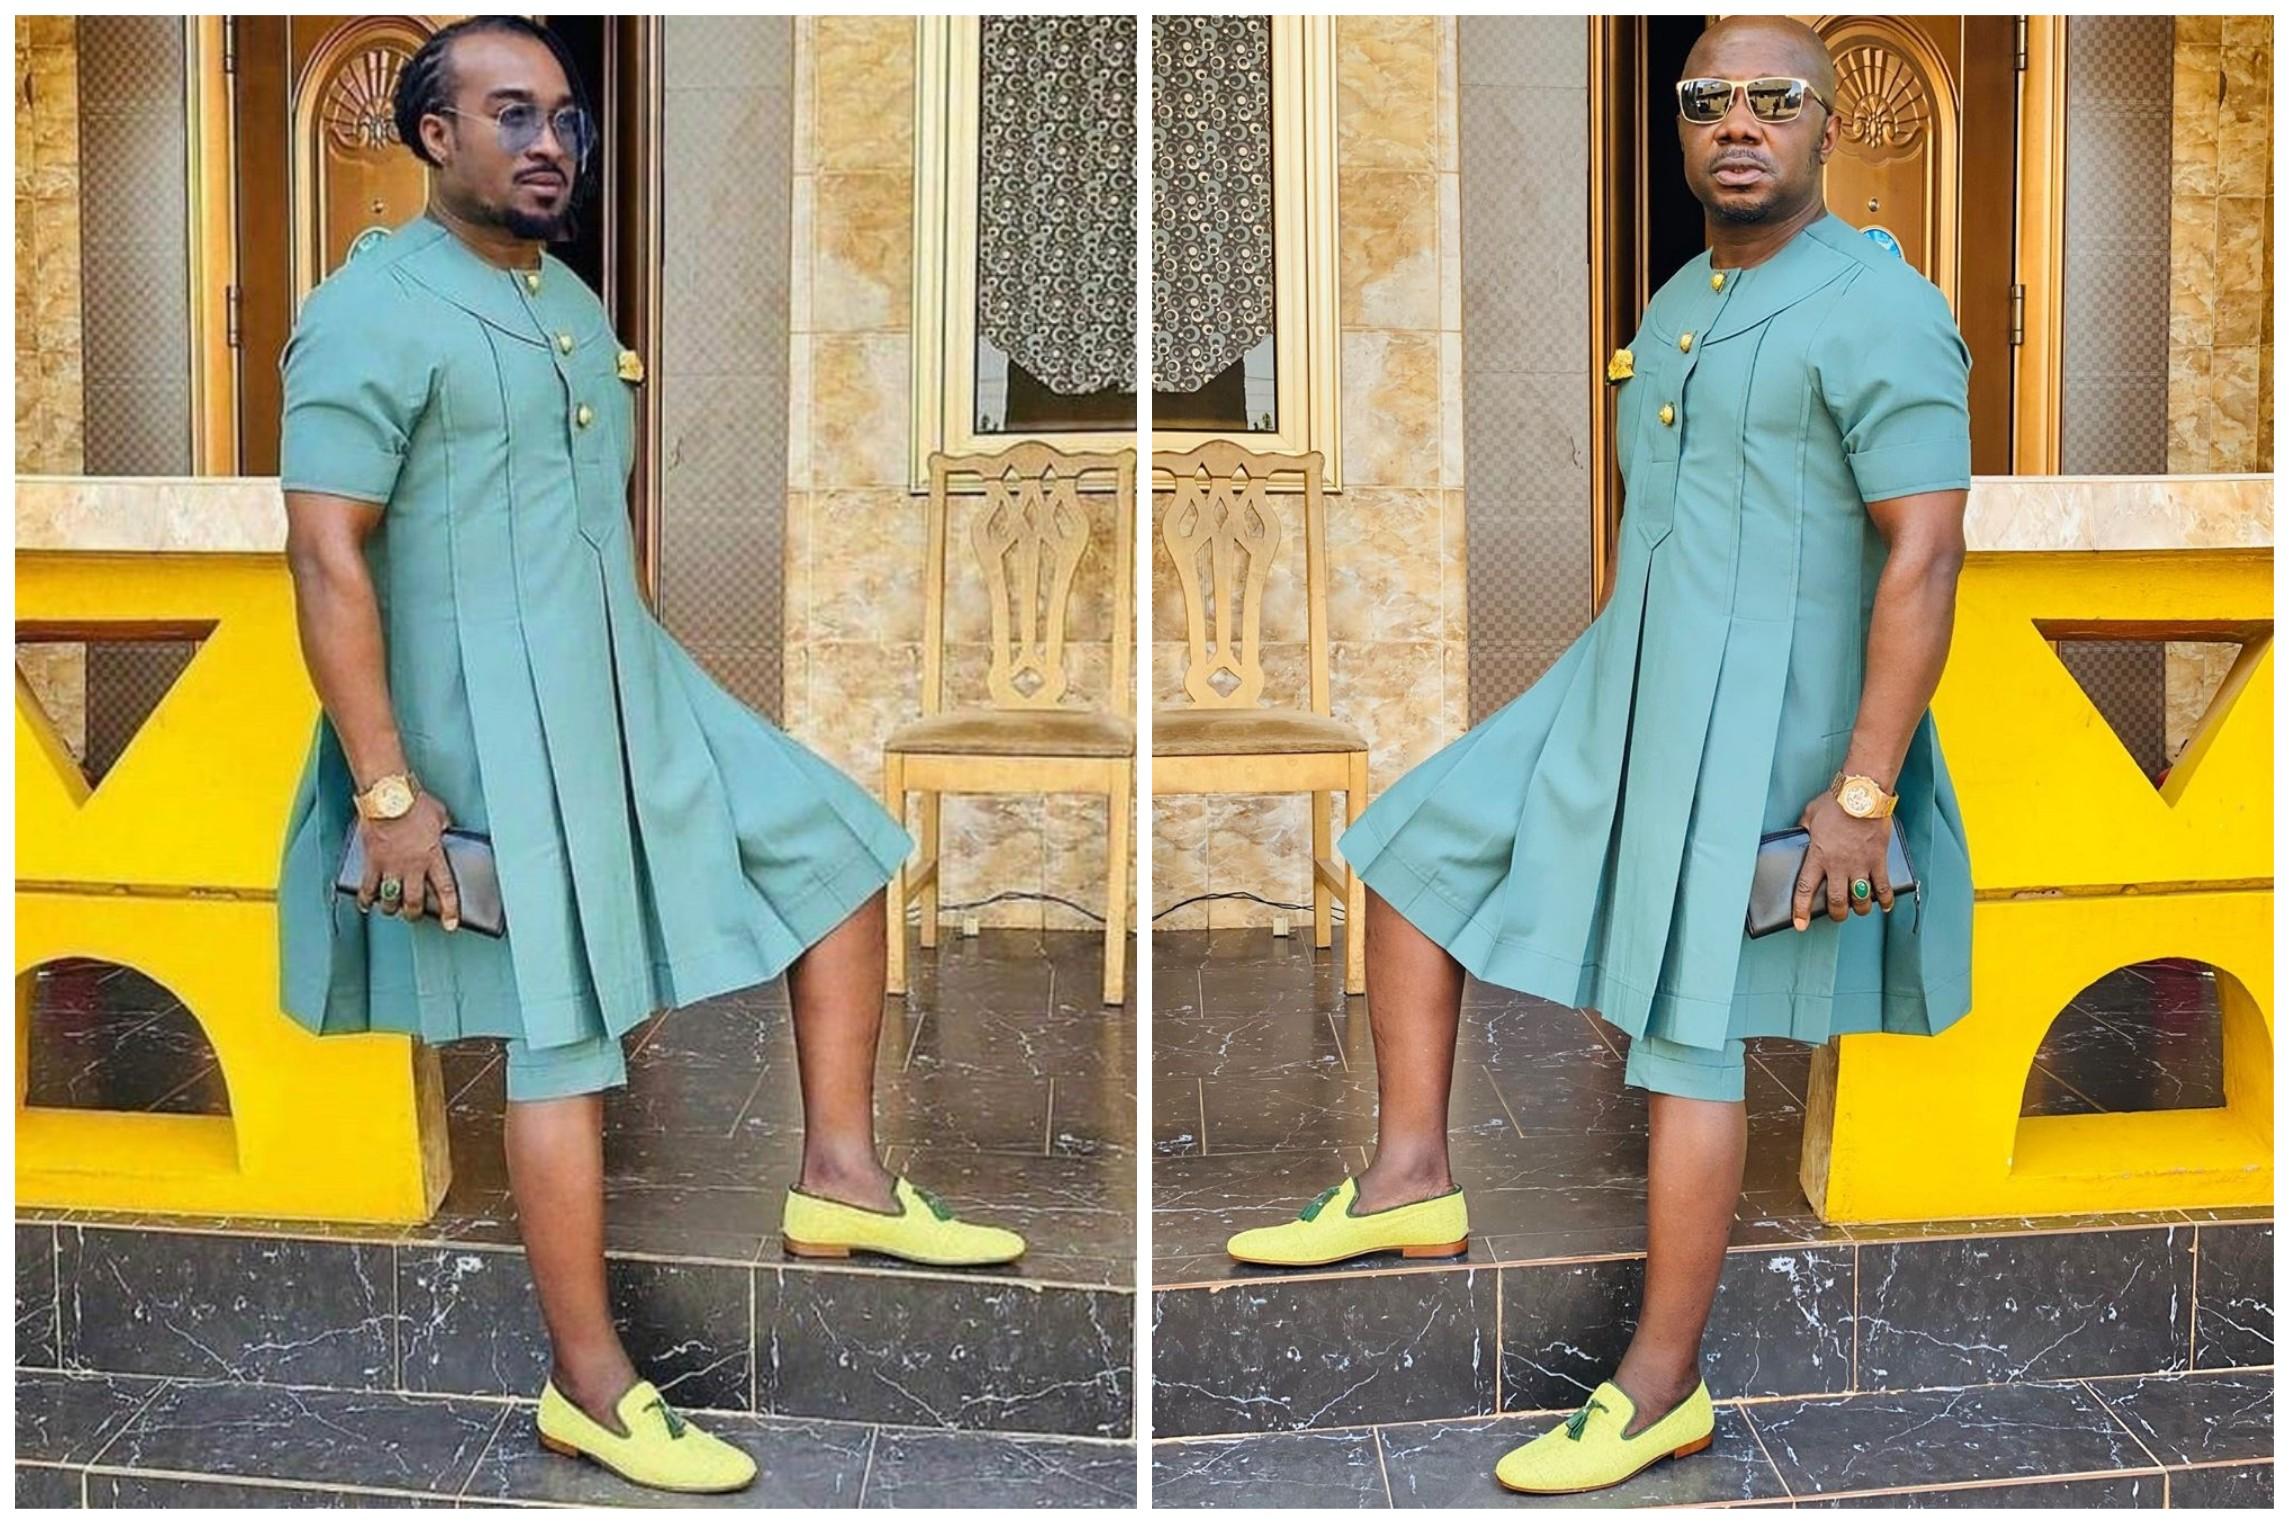 Nigerian Actor, Uti Nwachukwu Hails Osebor's Fashion Sense, Calls Him His Role Model thumbnail